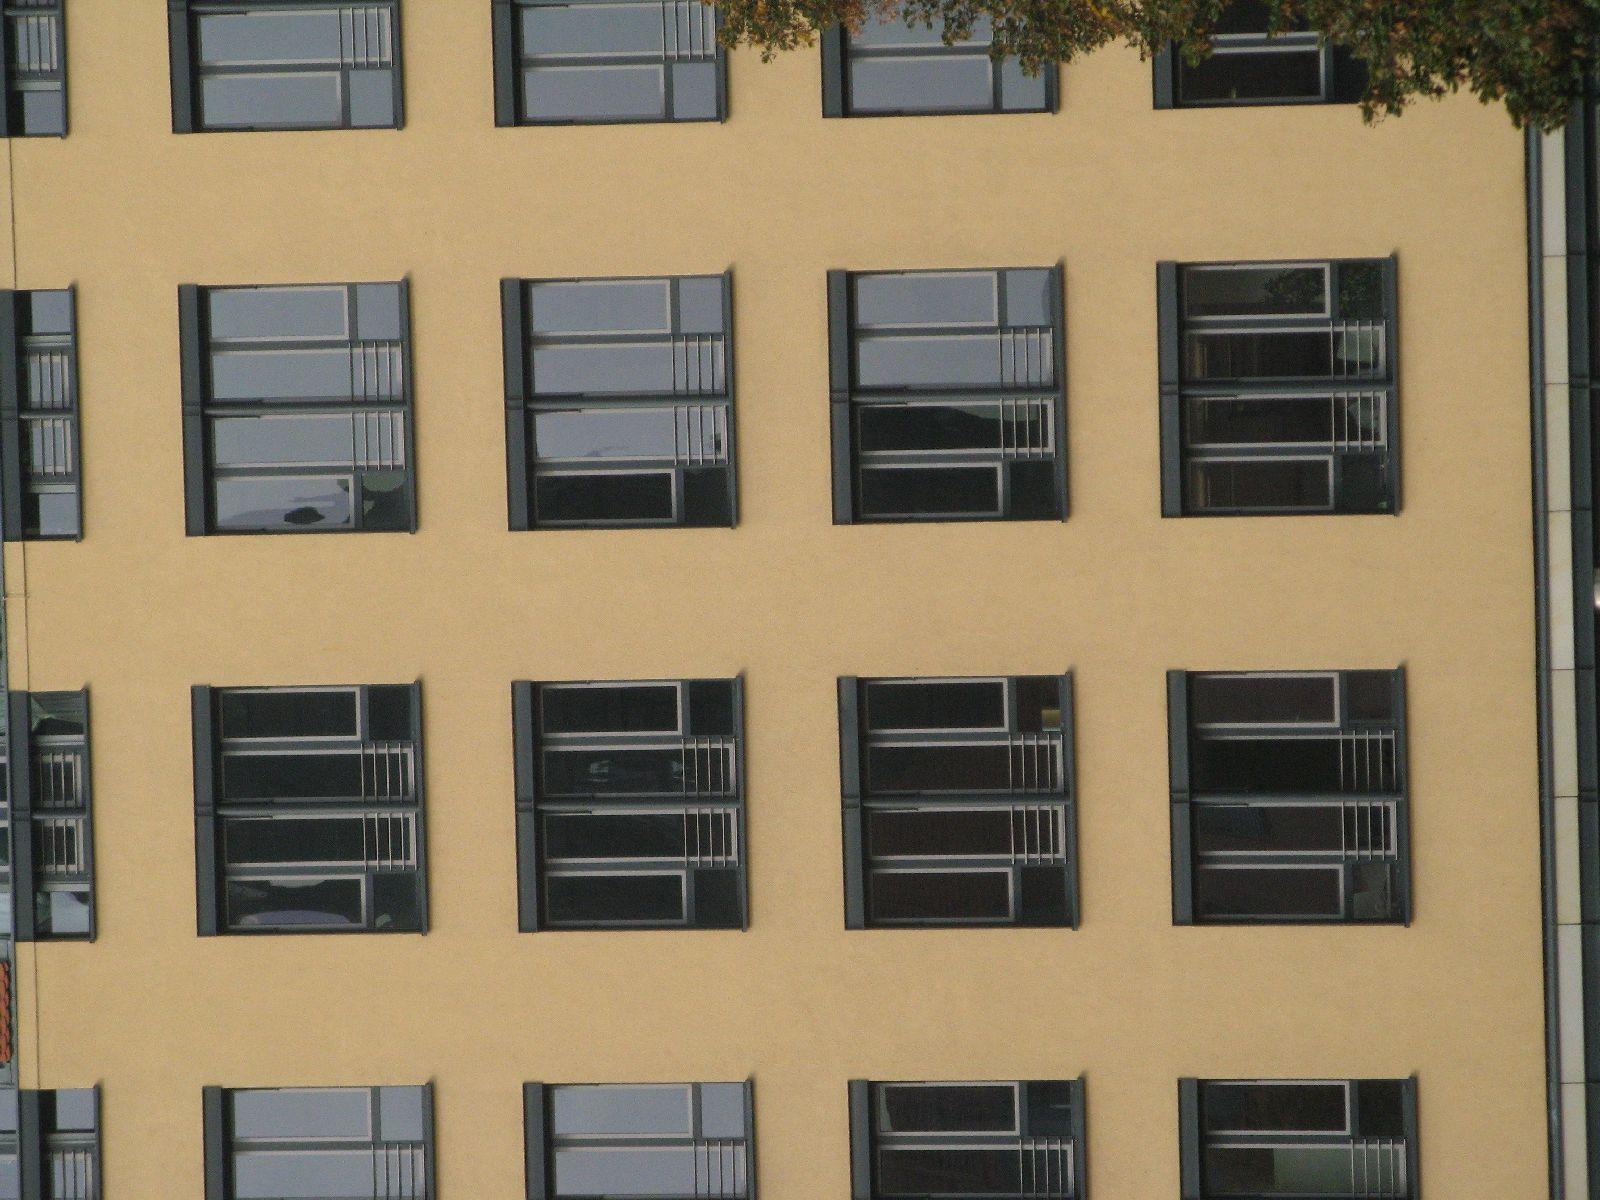 Gebaeude-Architektur_Textur_B_3570